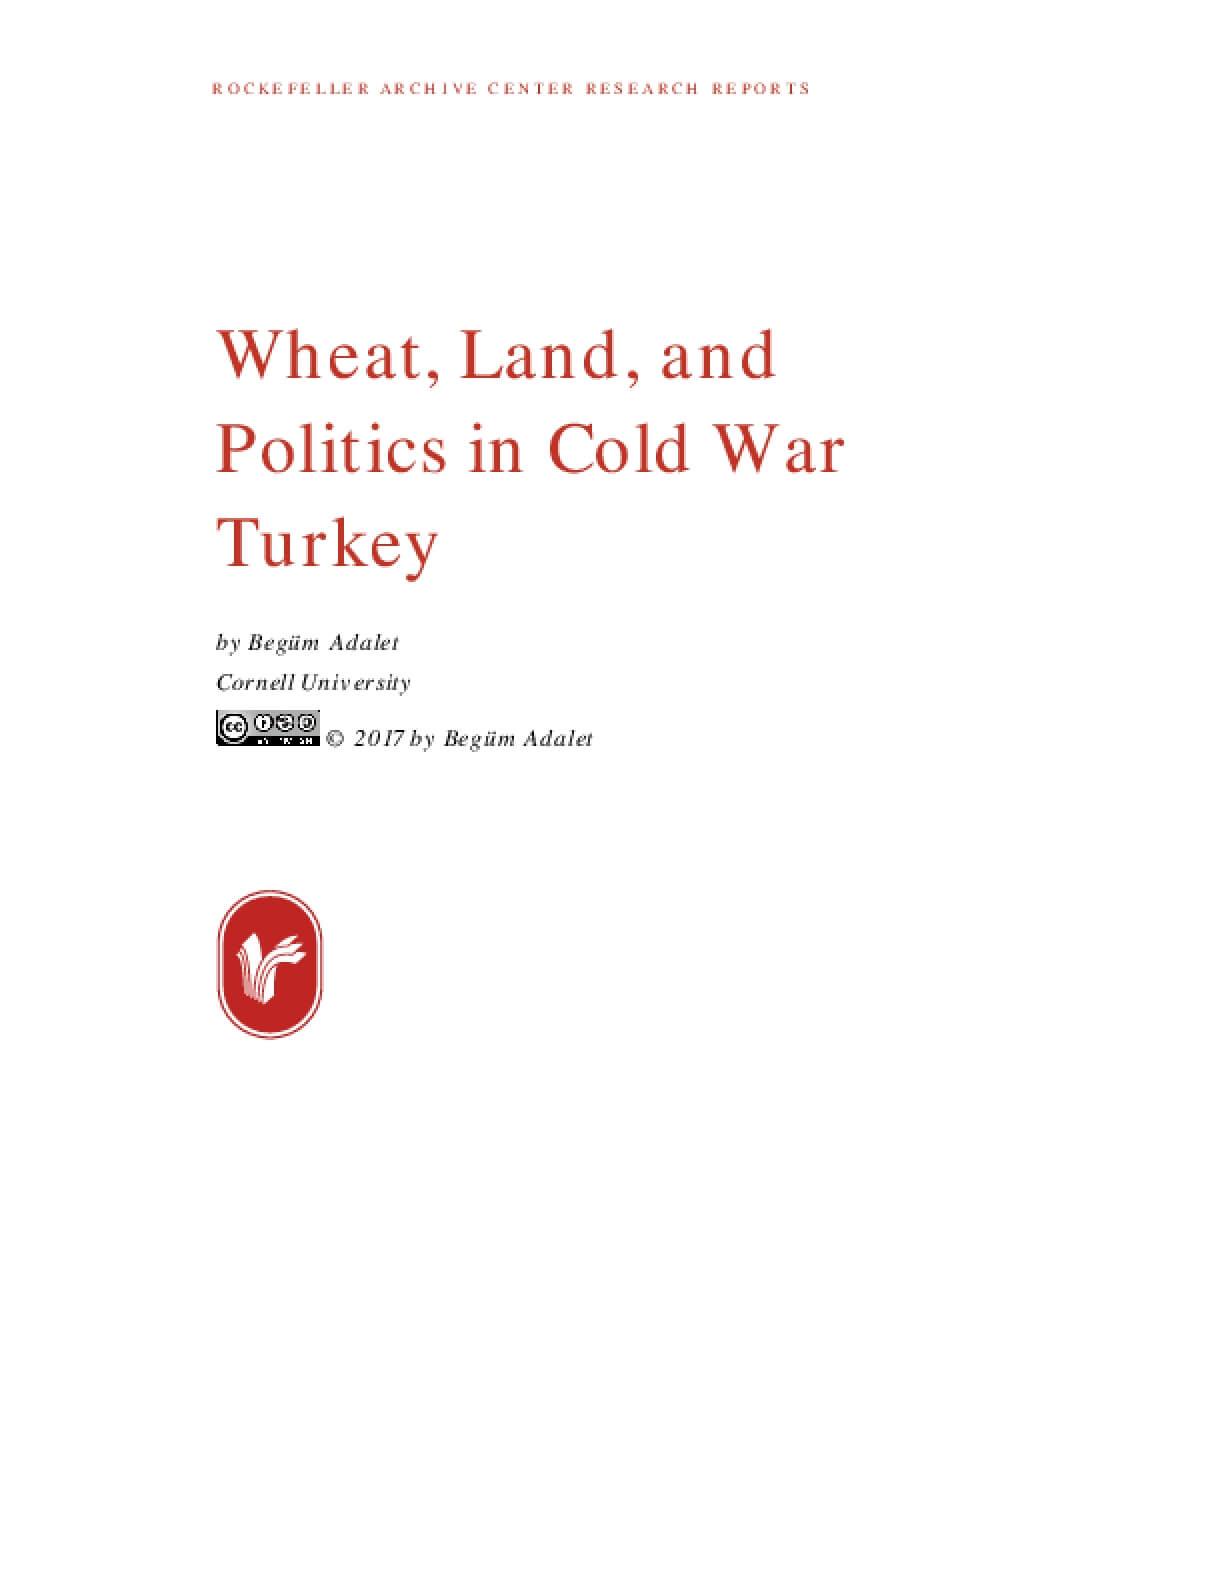 Wheat, Land, and Politics in Cold War Turkey